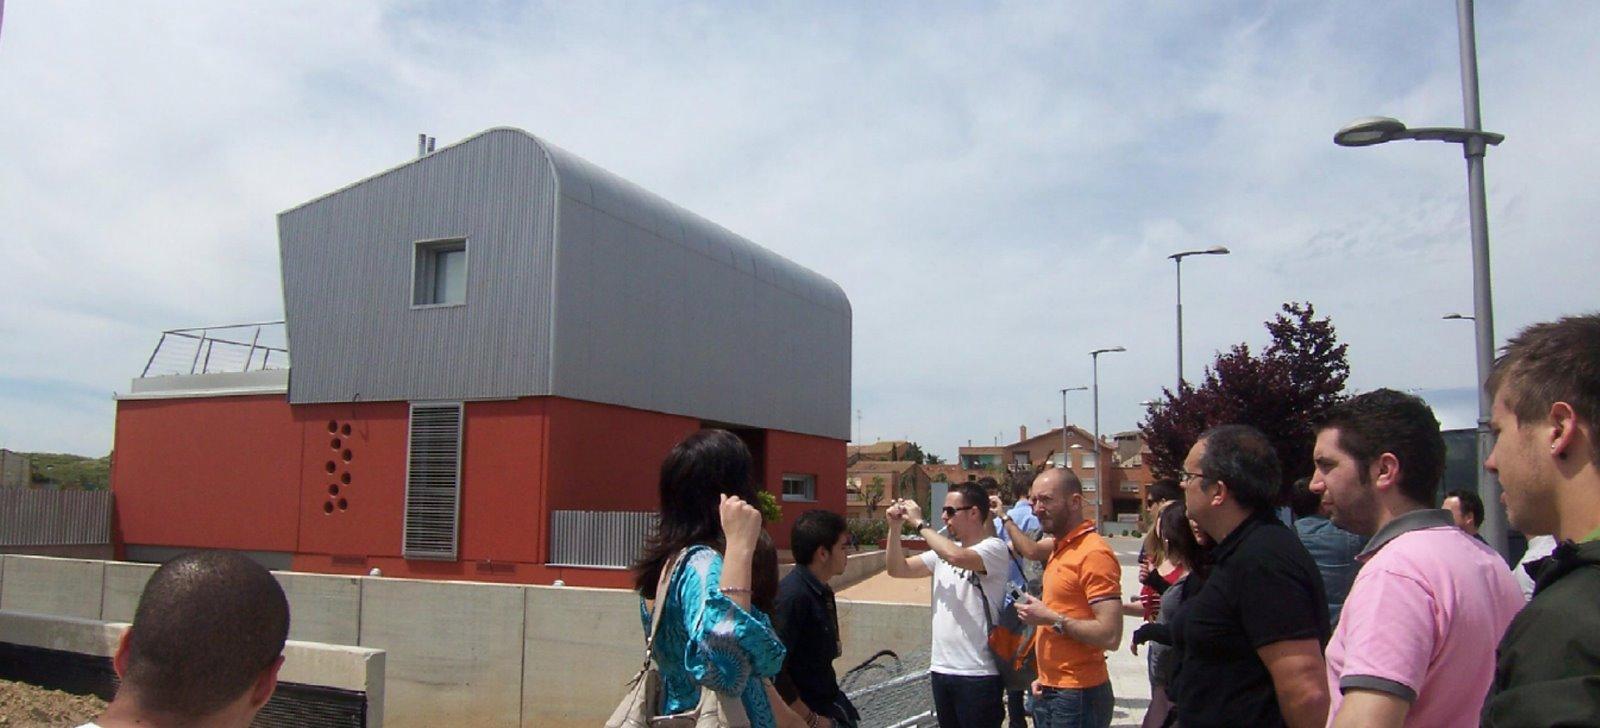 Construyendo la casa bioclim tica casas bioclim ticas - Casas bioclimaticas prefabricadas ...